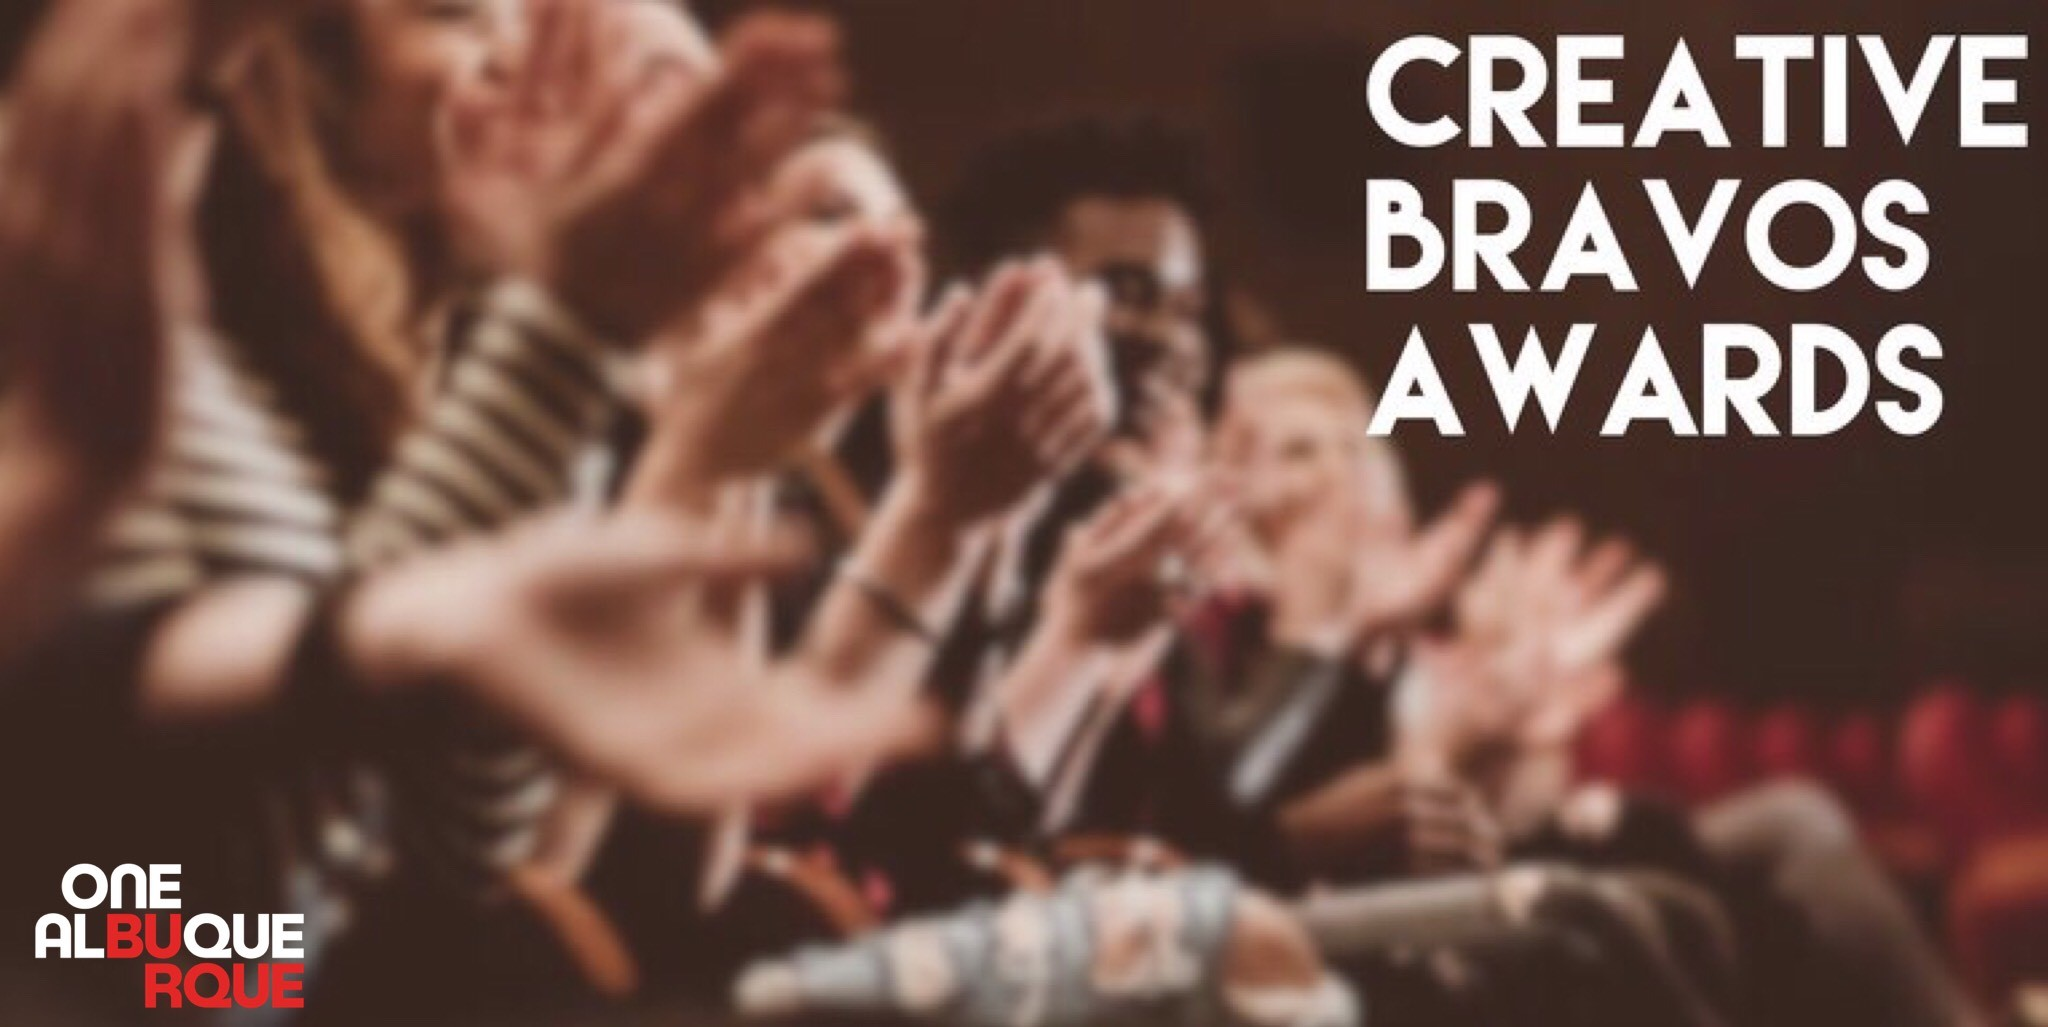 Creative Bravos Awards